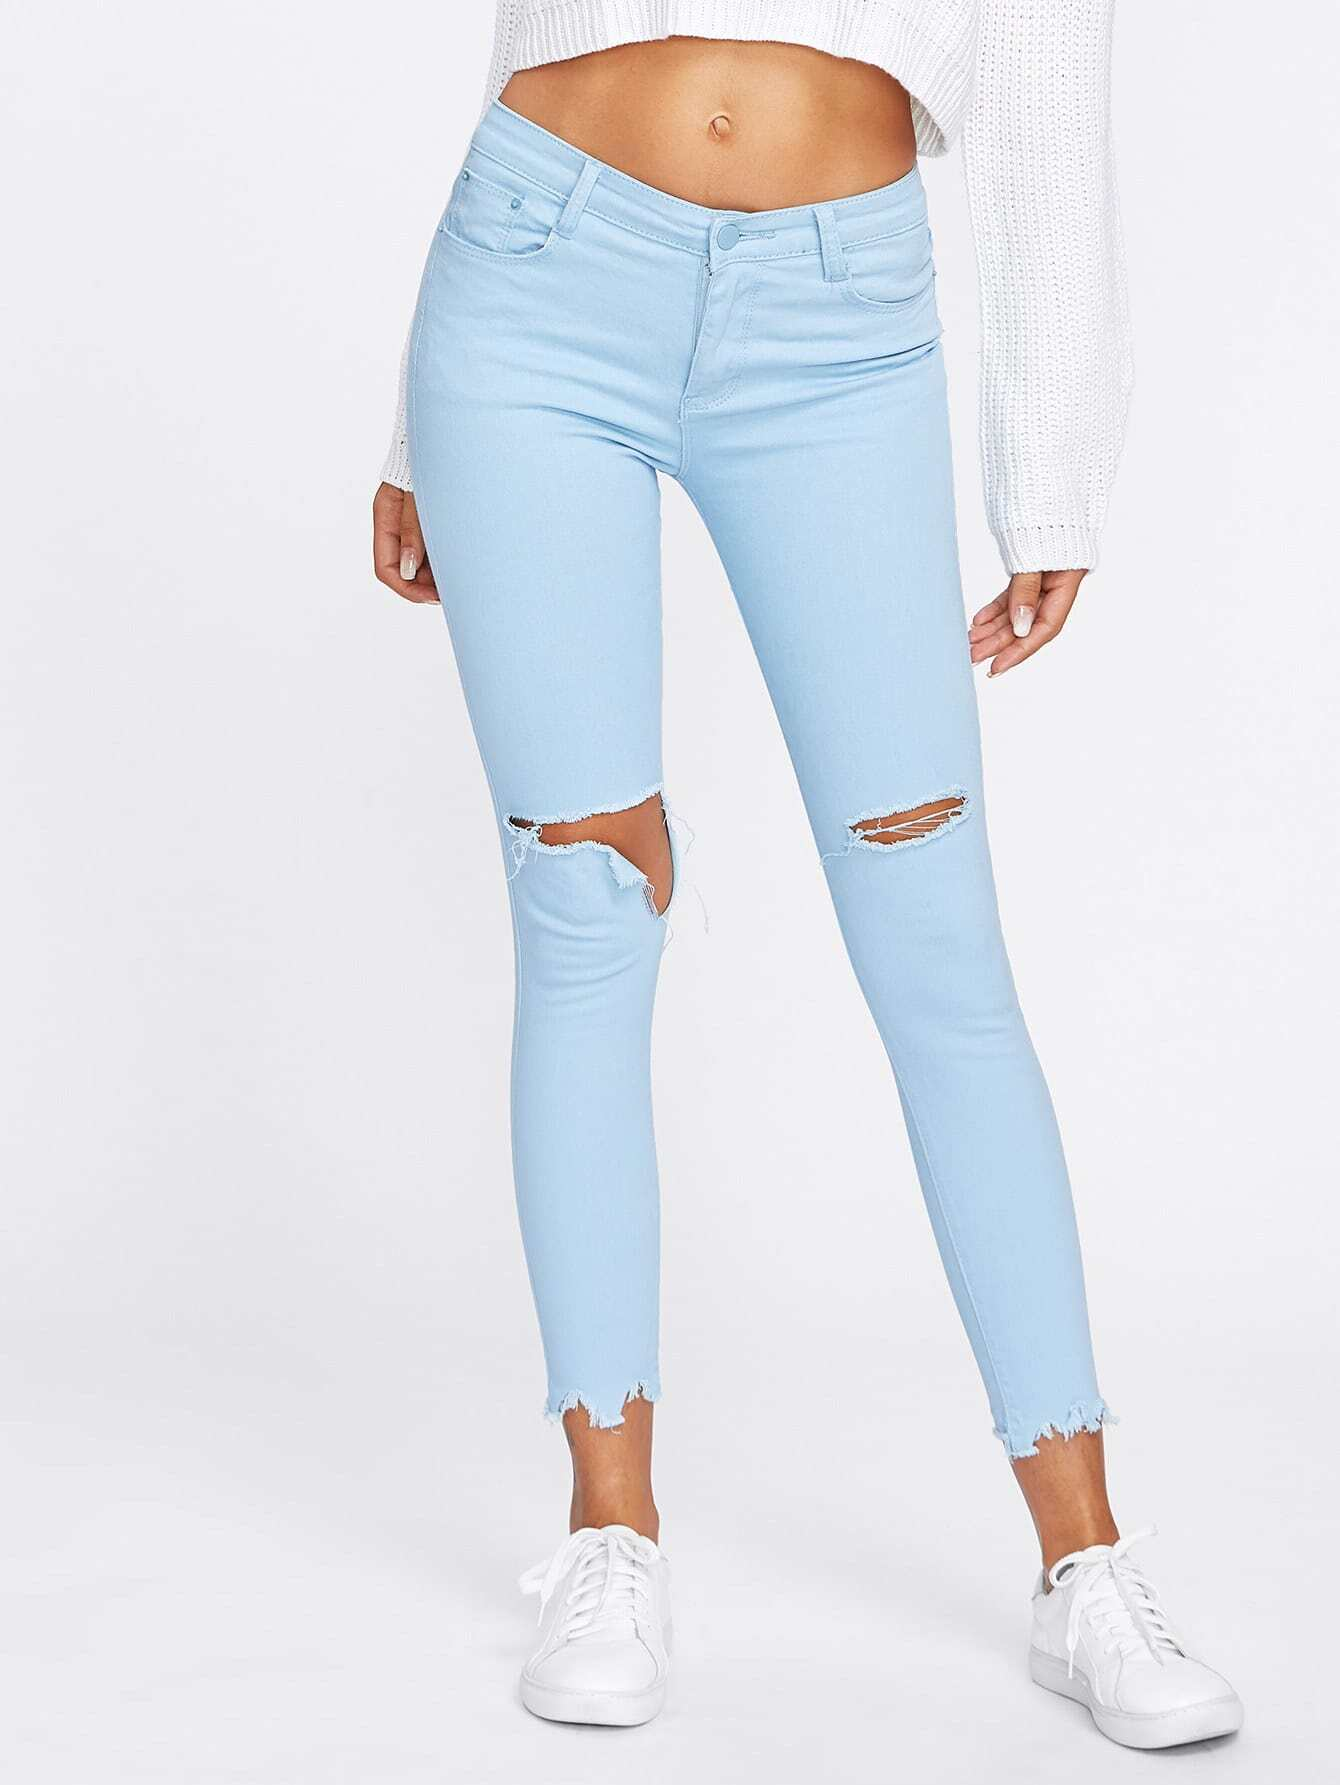 Ripped Raw Hem Jeans